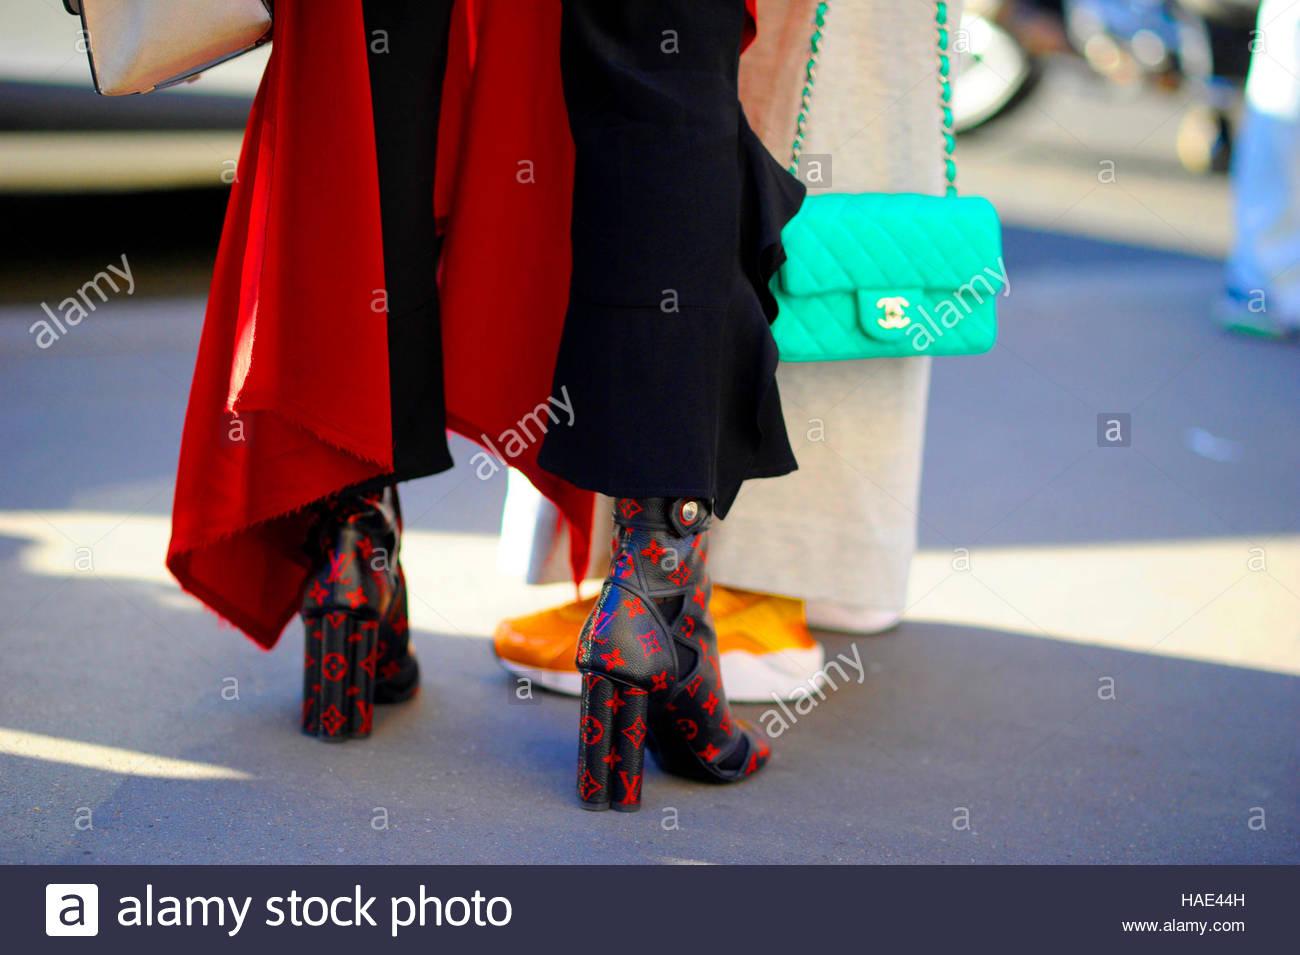 Detalle de las mujeres que acudían a la Stella McCartney Fashion show en la Place de l'Opéra Paris Imagen De Stock